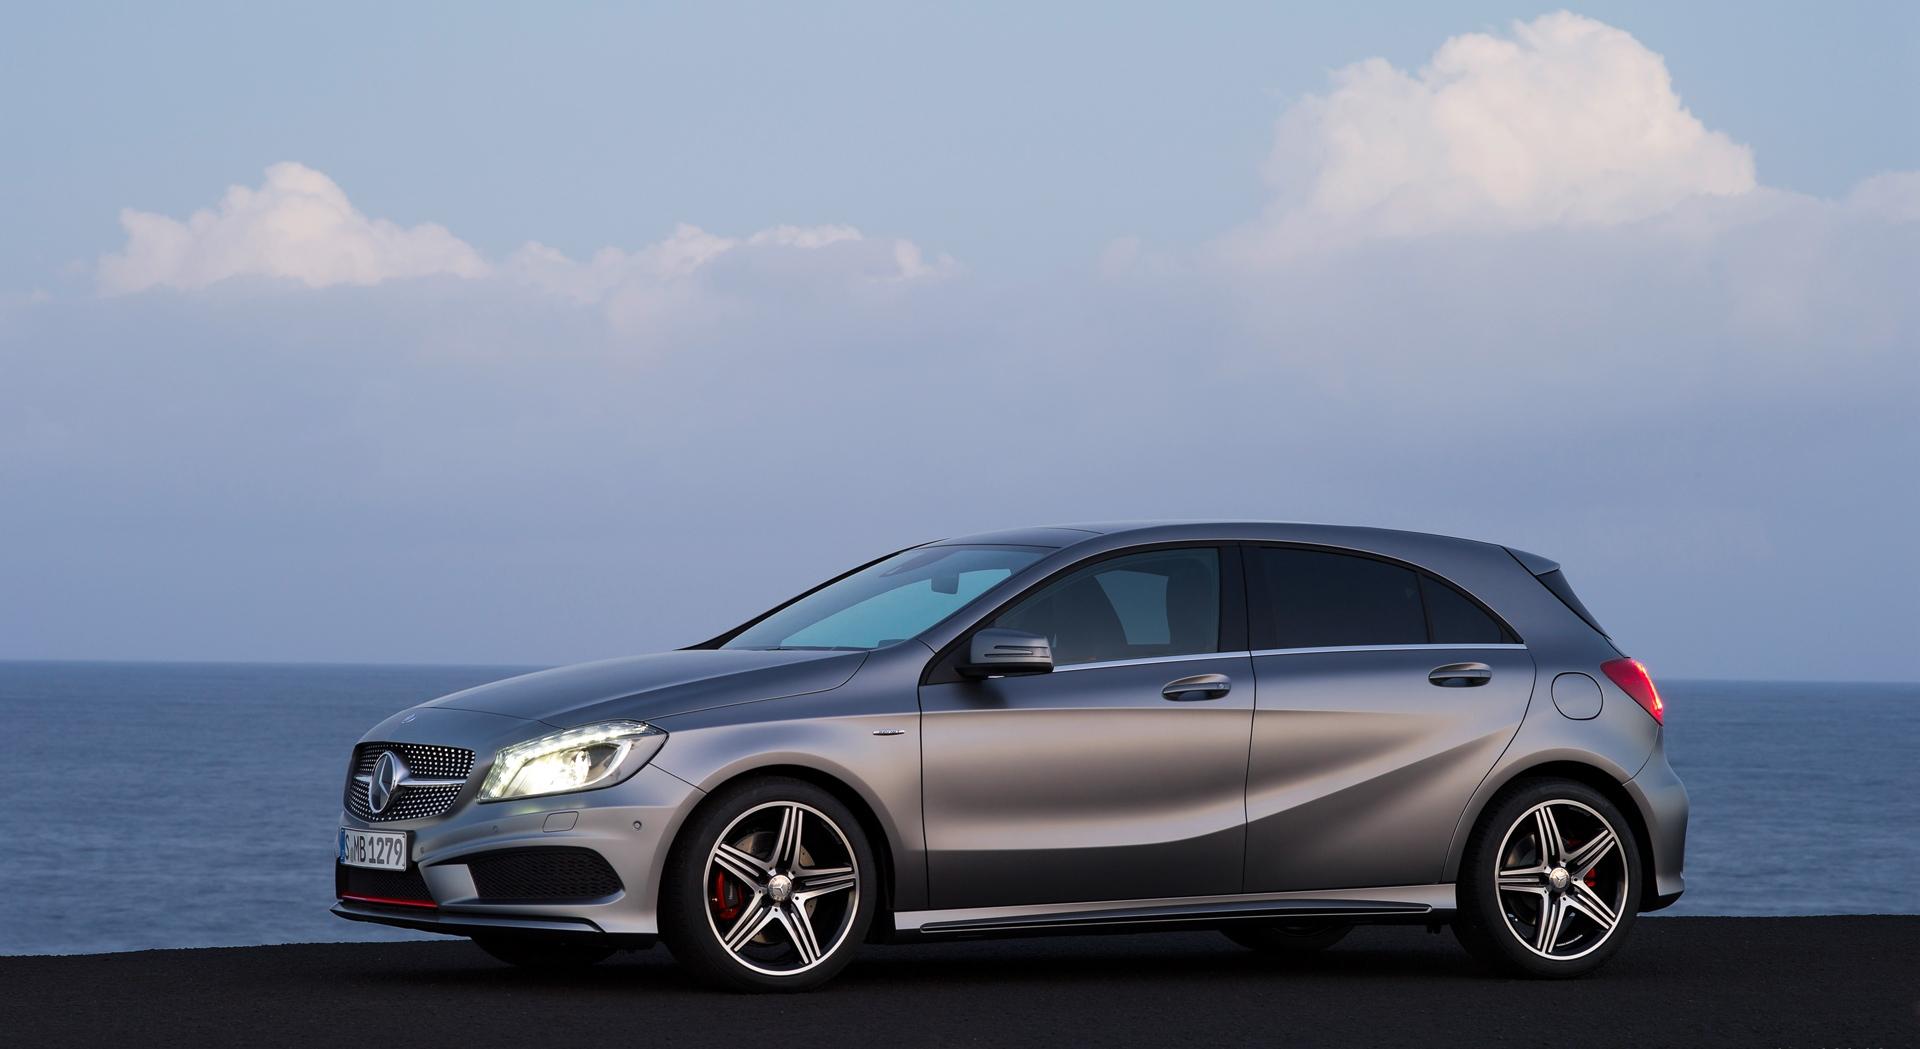 Cute Live Wallpaper Download Mercedes A Class Grey Sides Hd Desktop Wallpapers 4k Hd